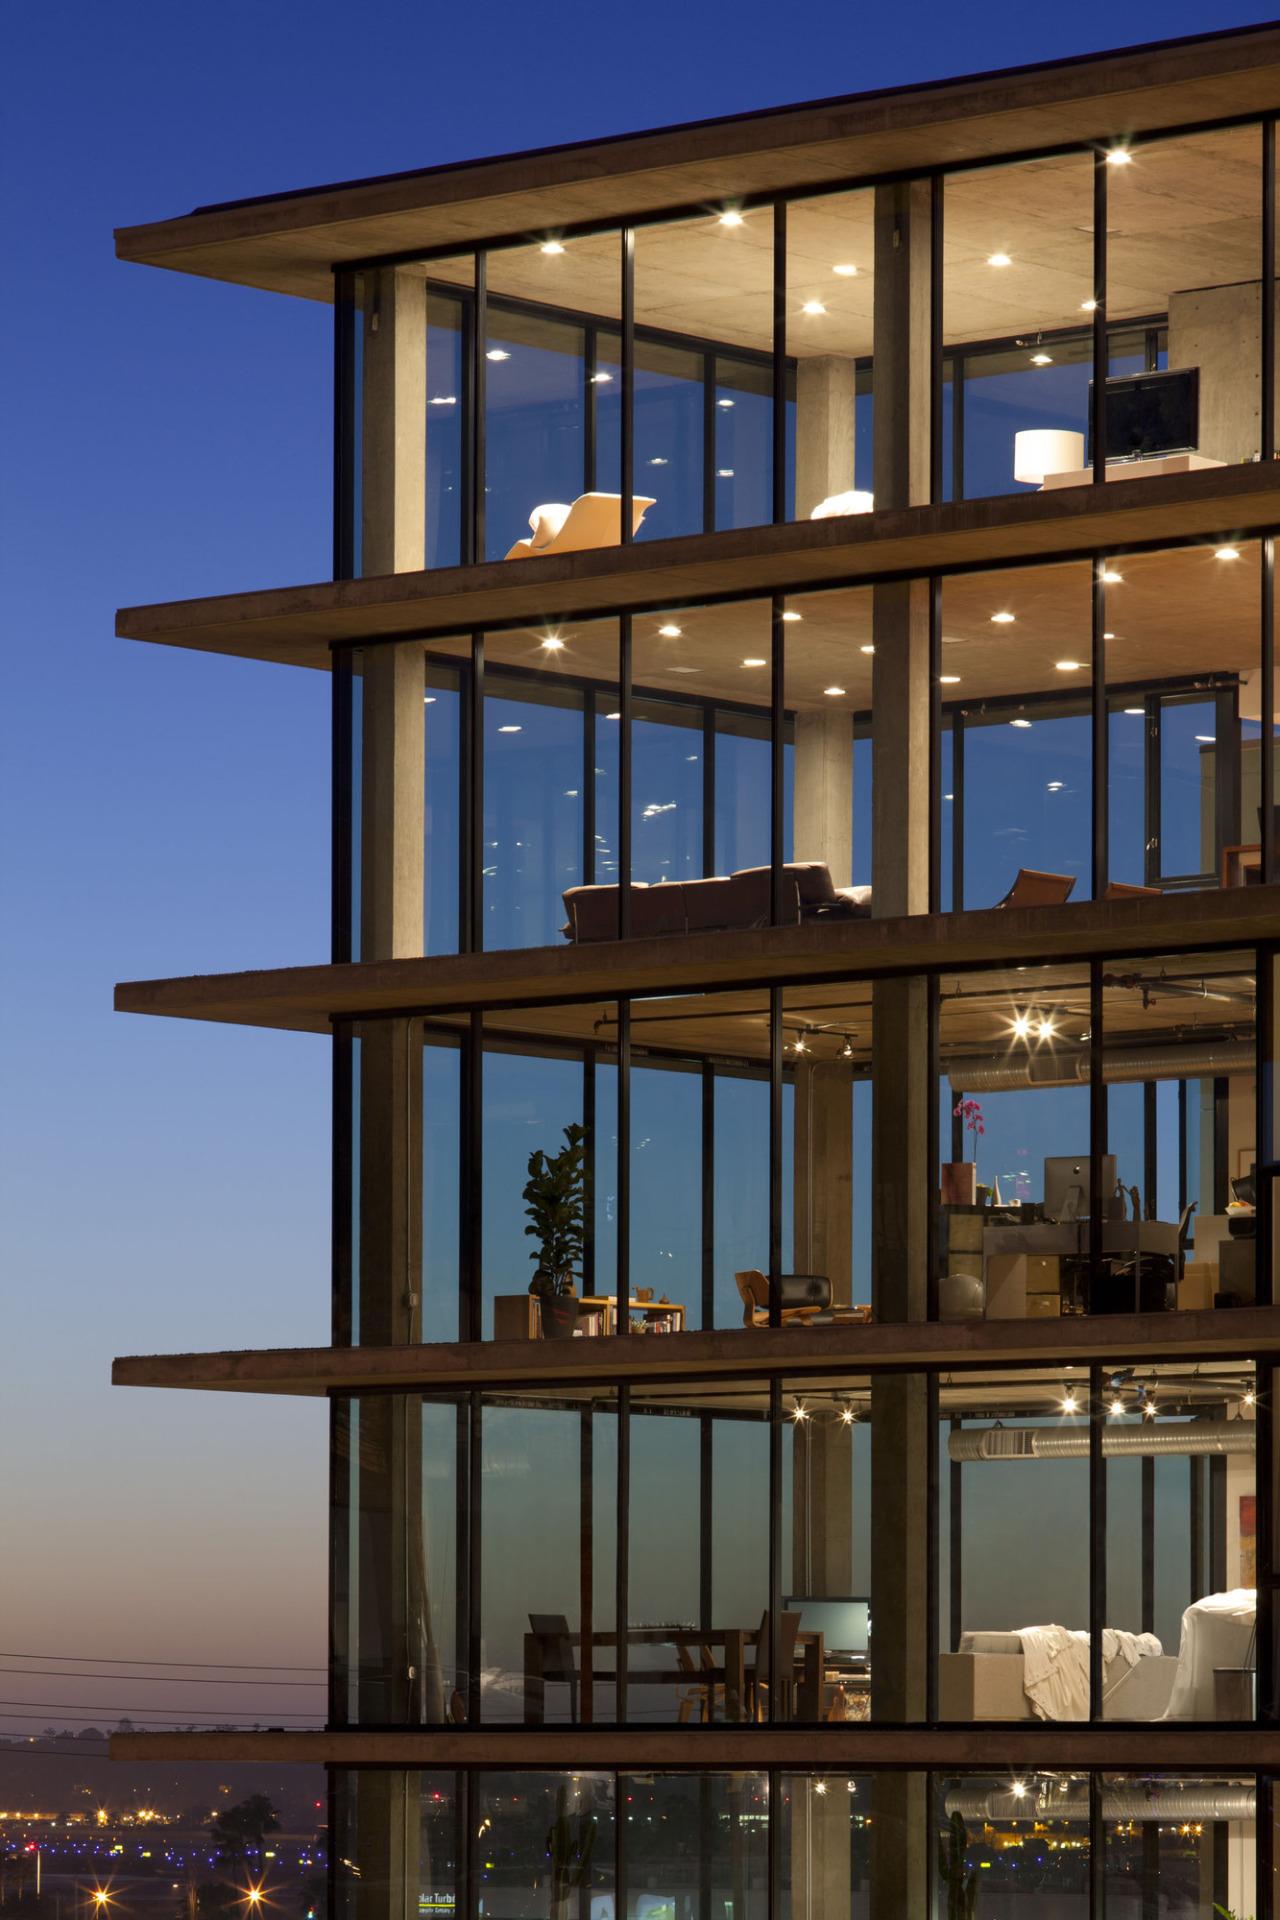 luxury house architecture house construction balcony sky city home window modern